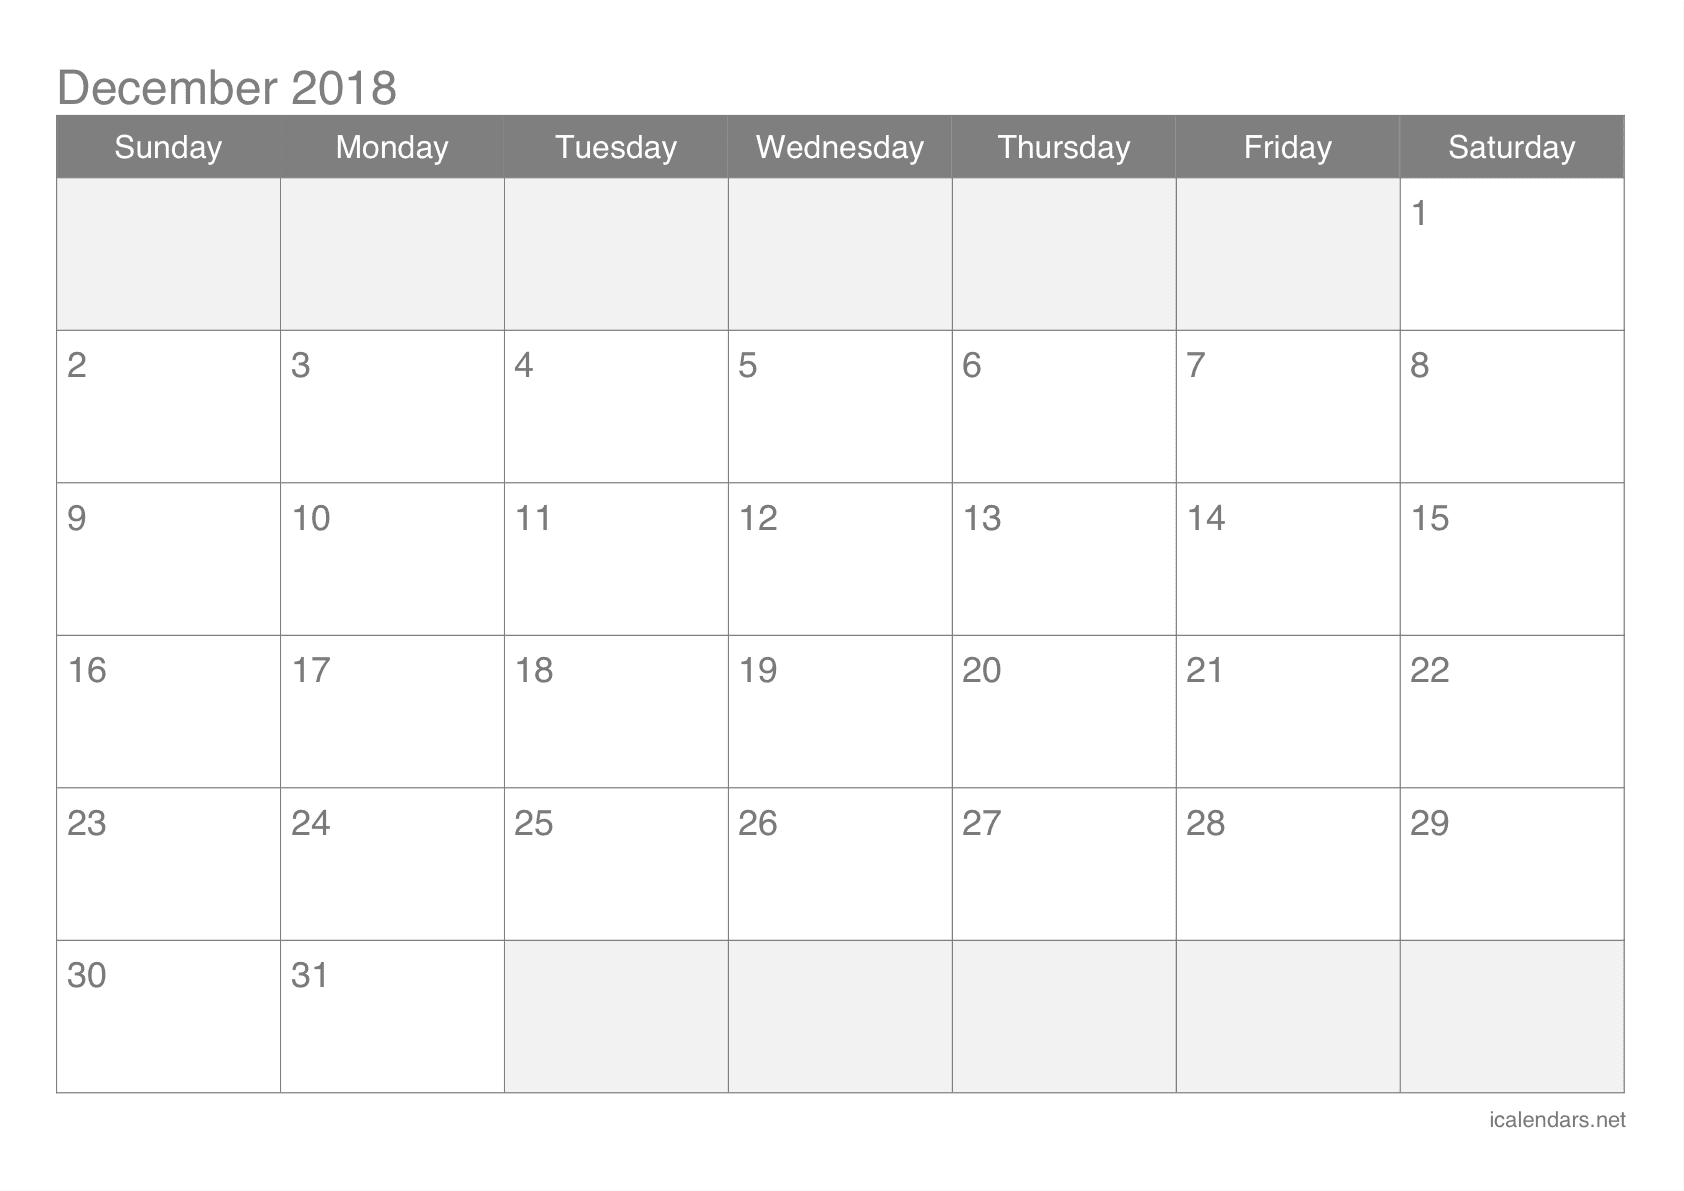 Print December 2018 Blank Calendar